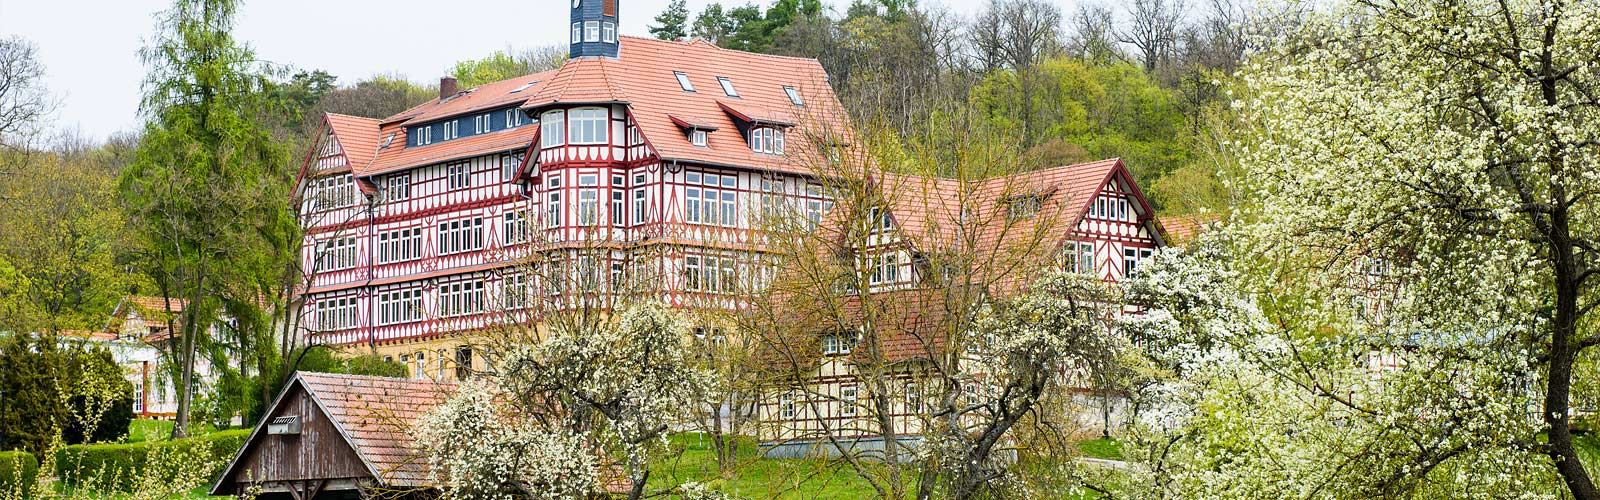 Hermann-Lietz-Schule Haubinda